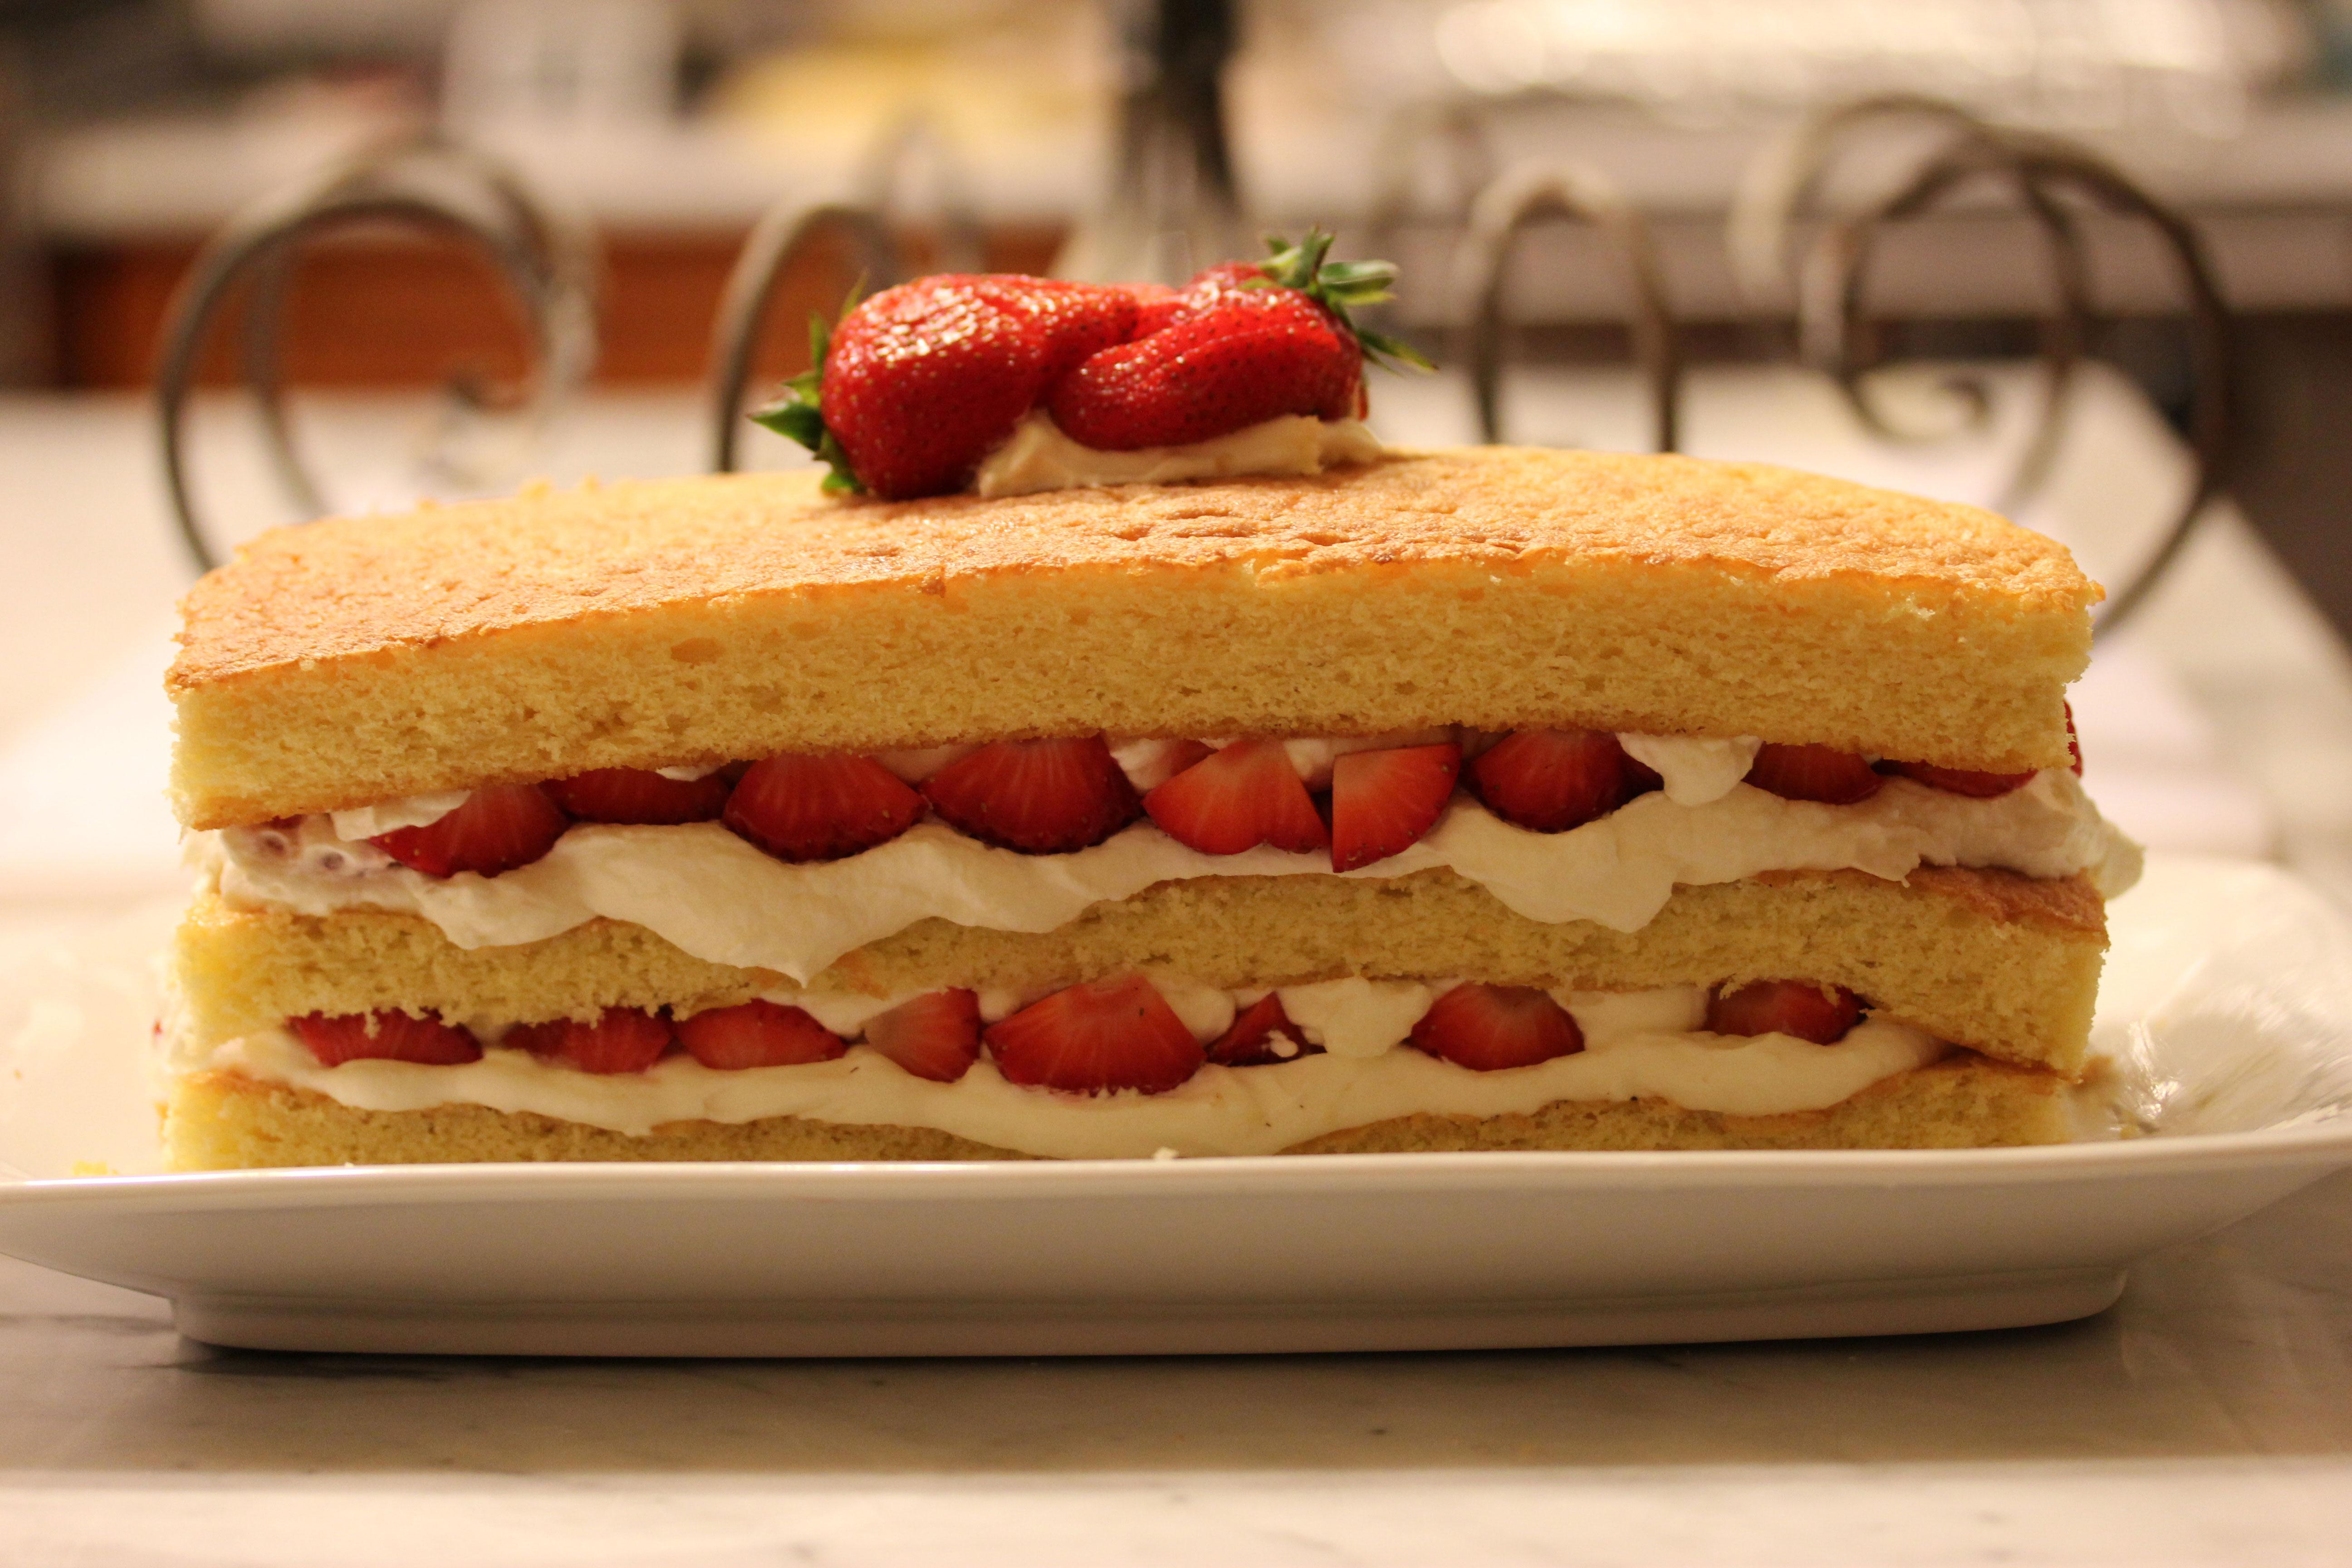 Strawberry and White Chocolate Buttermilk Cake